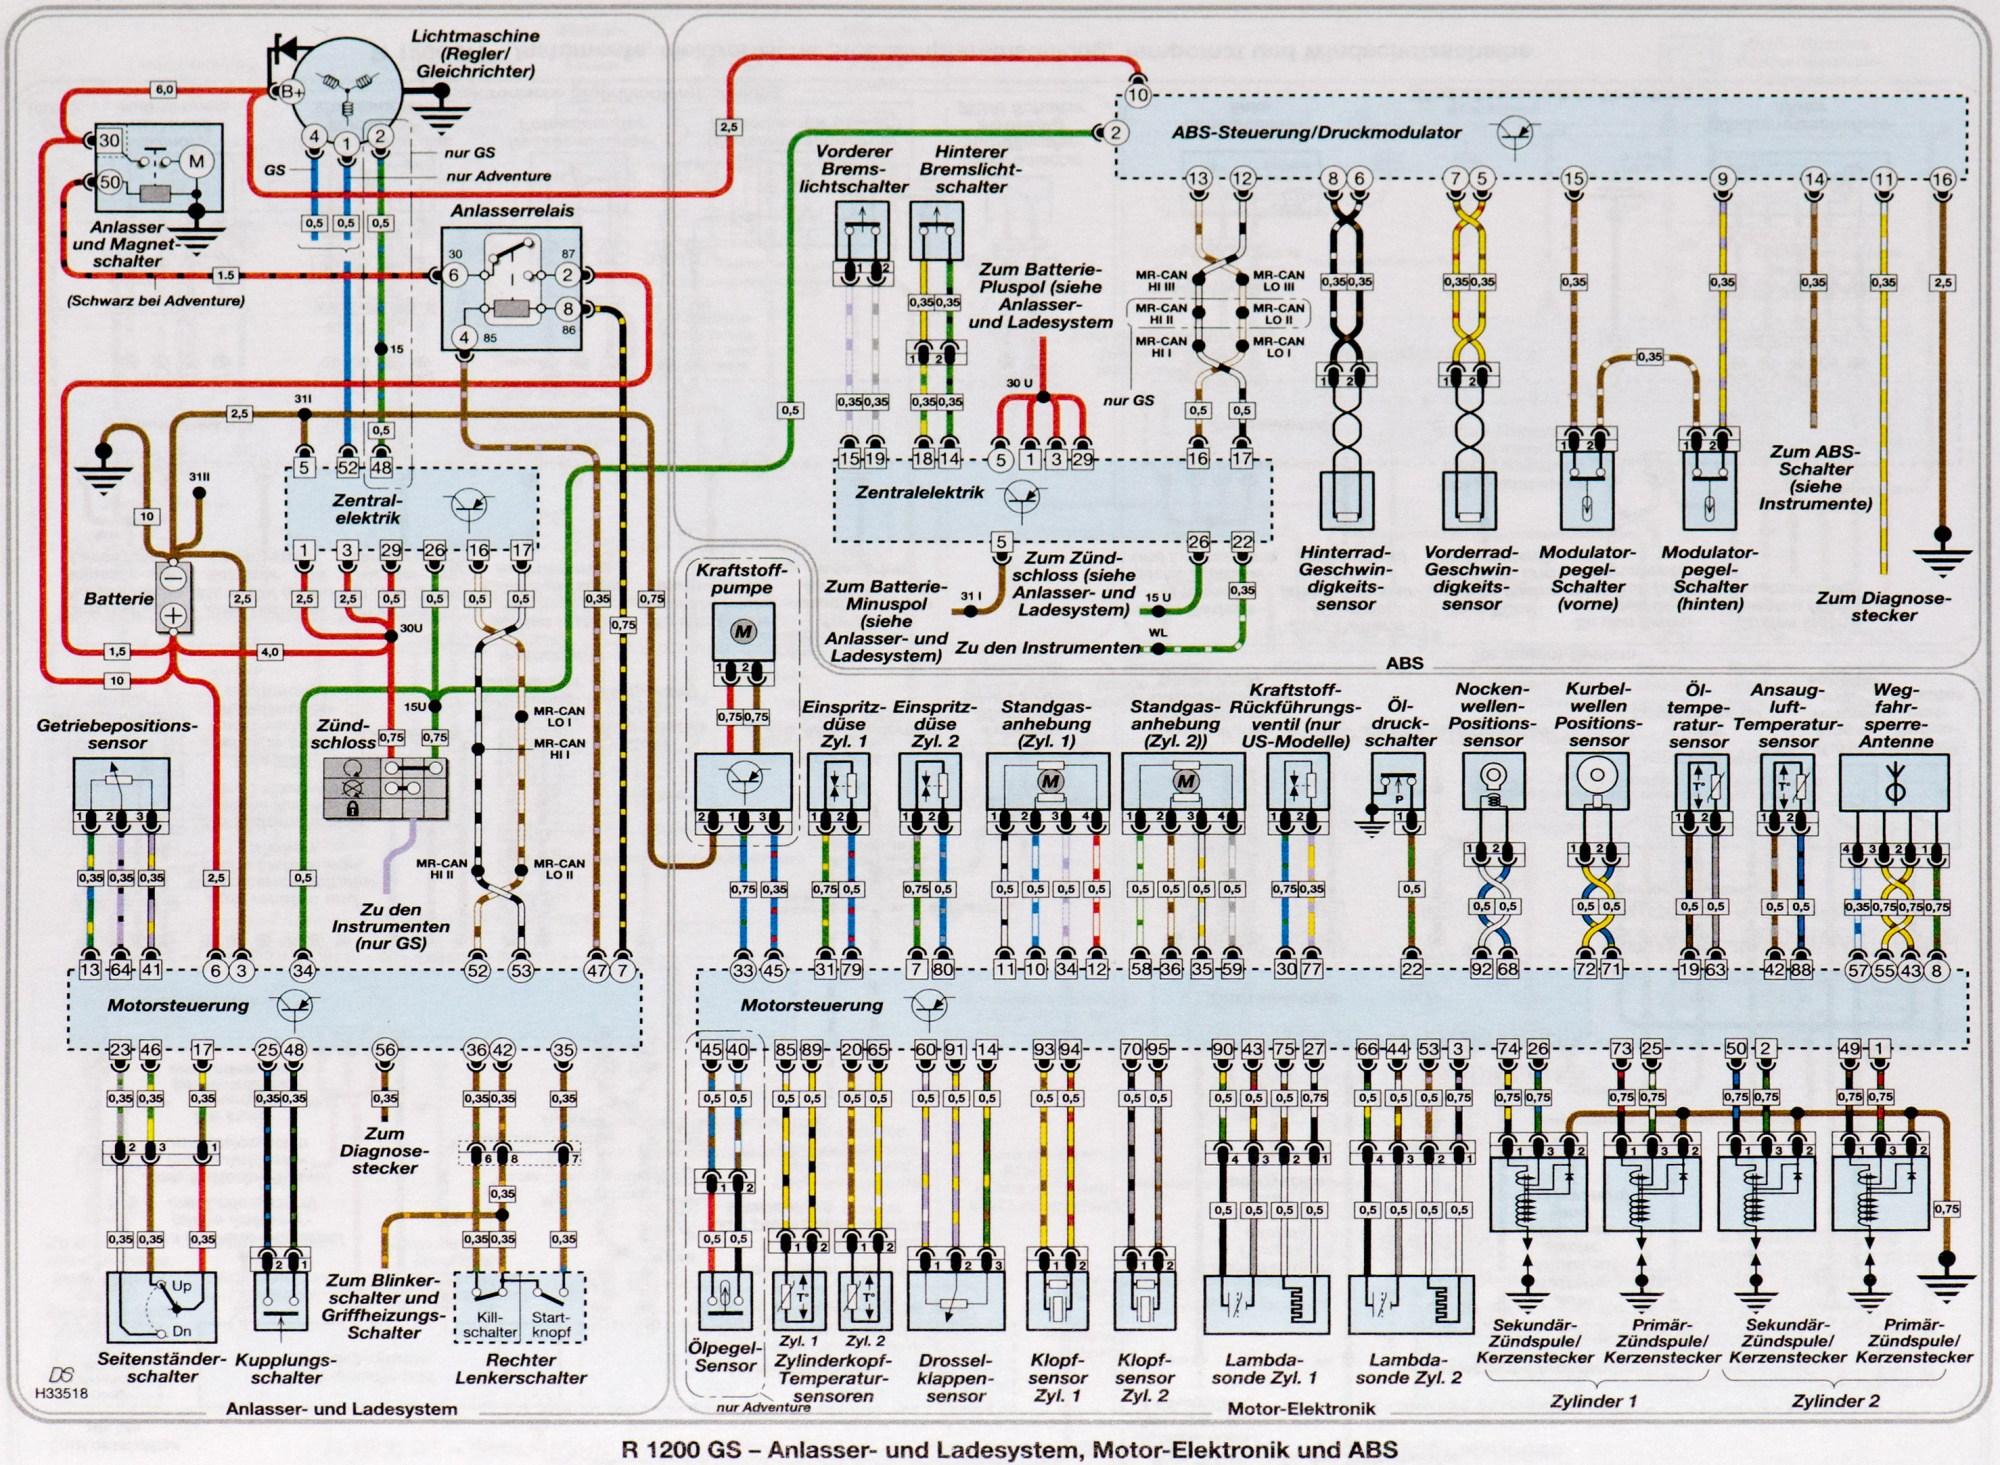 hight resolution of e46 wiring diagram pdf e46 engine bay diagram wiring bmw e46 navigacija kupovina bmw e46 navigacija kupovina